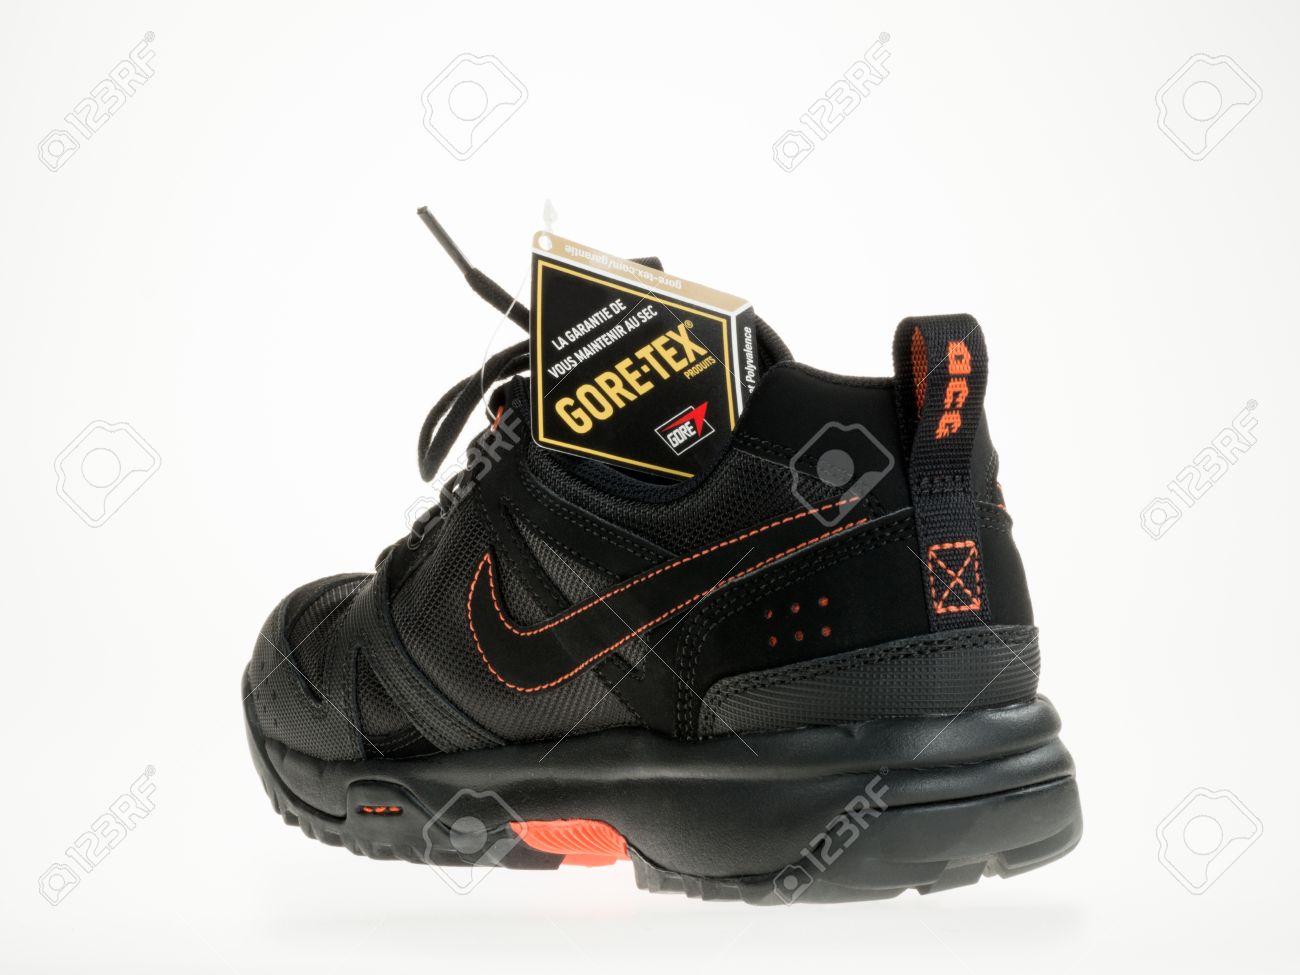 New With 52014 Hiking Nike IstanbulTurkey Shoe February 3jq5RcA4L